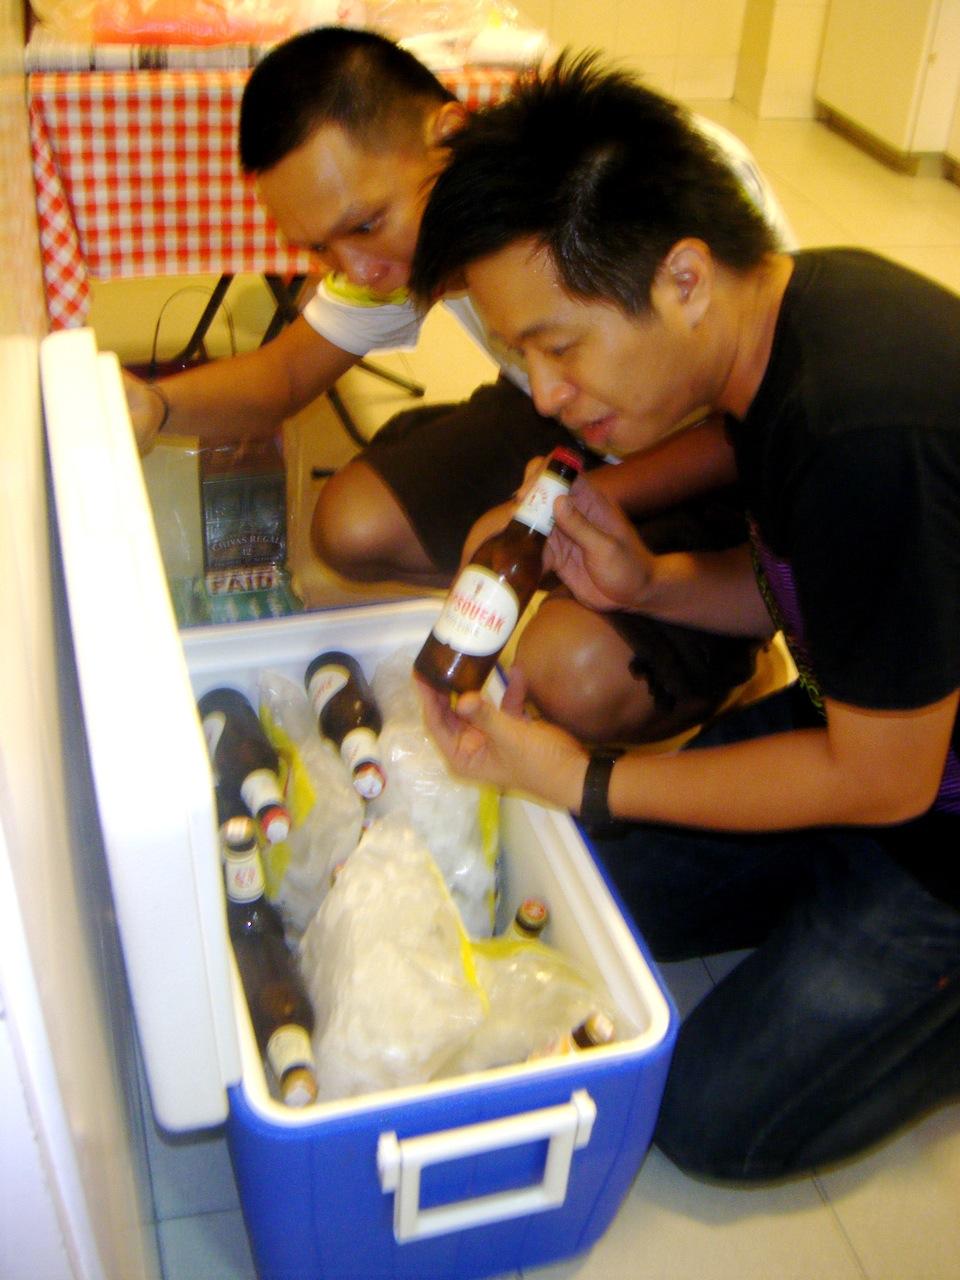 Edwin & Paul find the treasure chest. Alcohol galore!